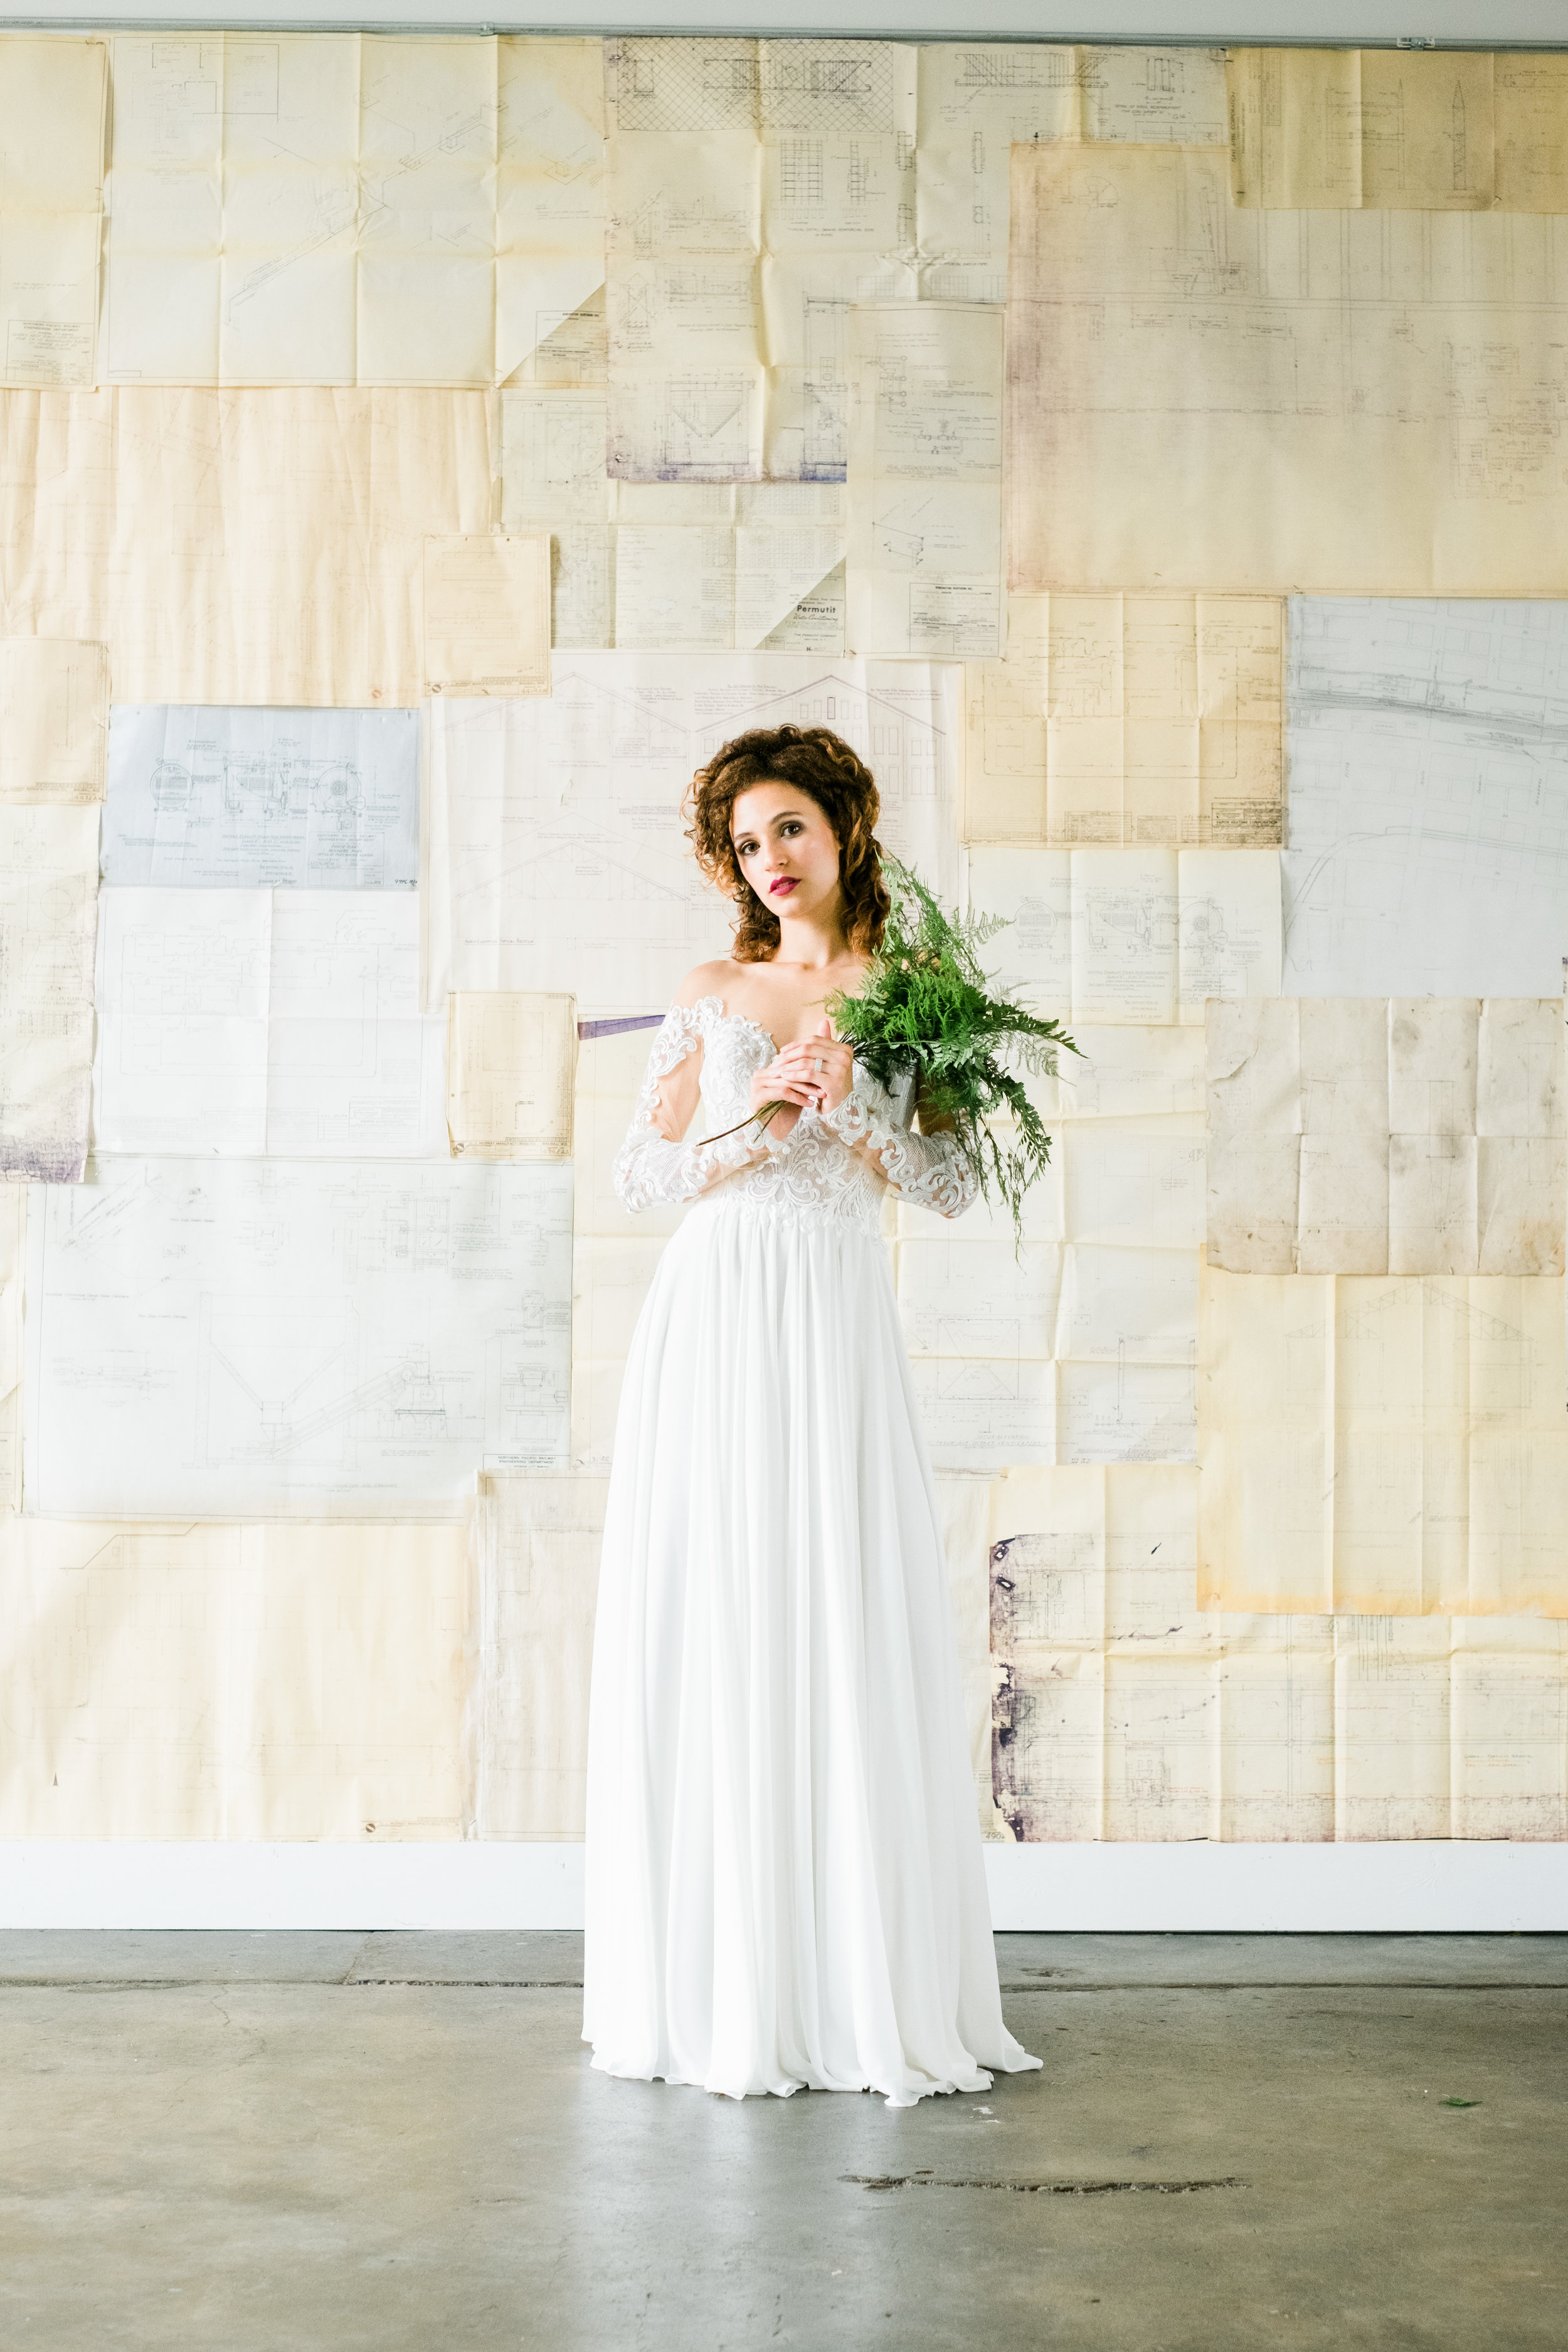 fern + floret botanial mn editorial floral design | central minnesota brides magazine | editorial florist installation | tim larsen photography | np event space storehouse 1531